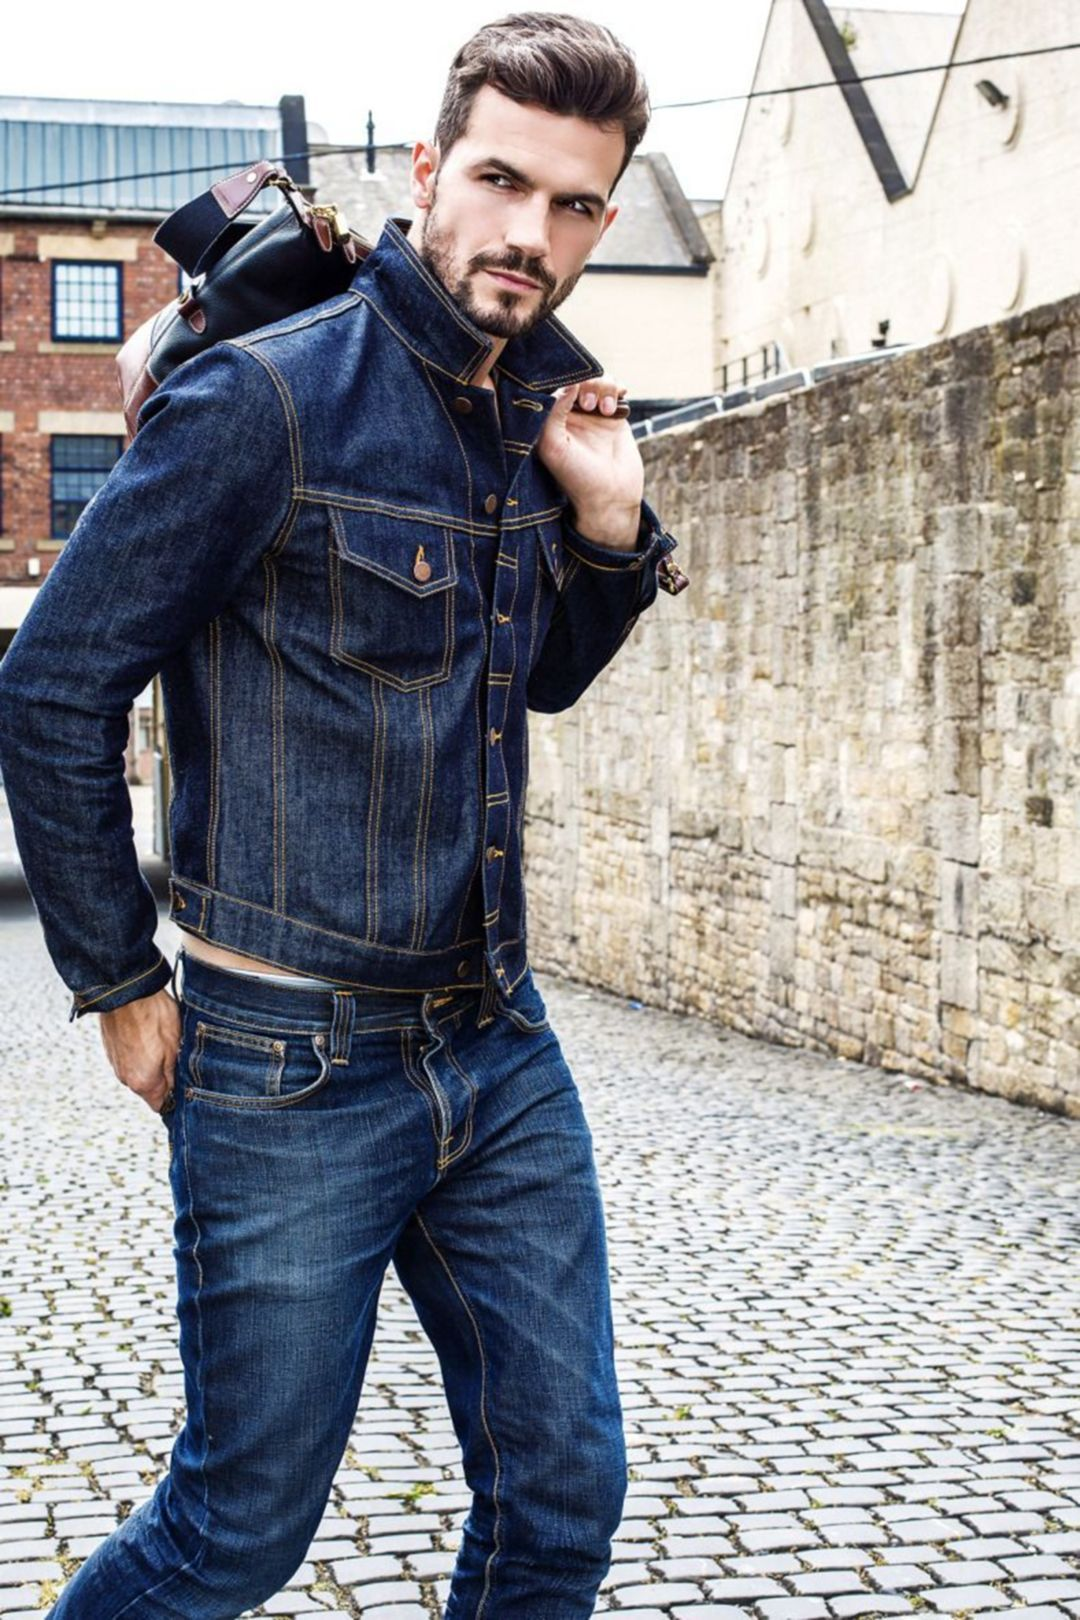 45 Awesome Jeans Jackets Ideas For Men Look Cooler Fashions Nowadays Mens Fashion Denim Denim Fashion Mens Fashion Casual [ 1620 x 1080 Pixel ]